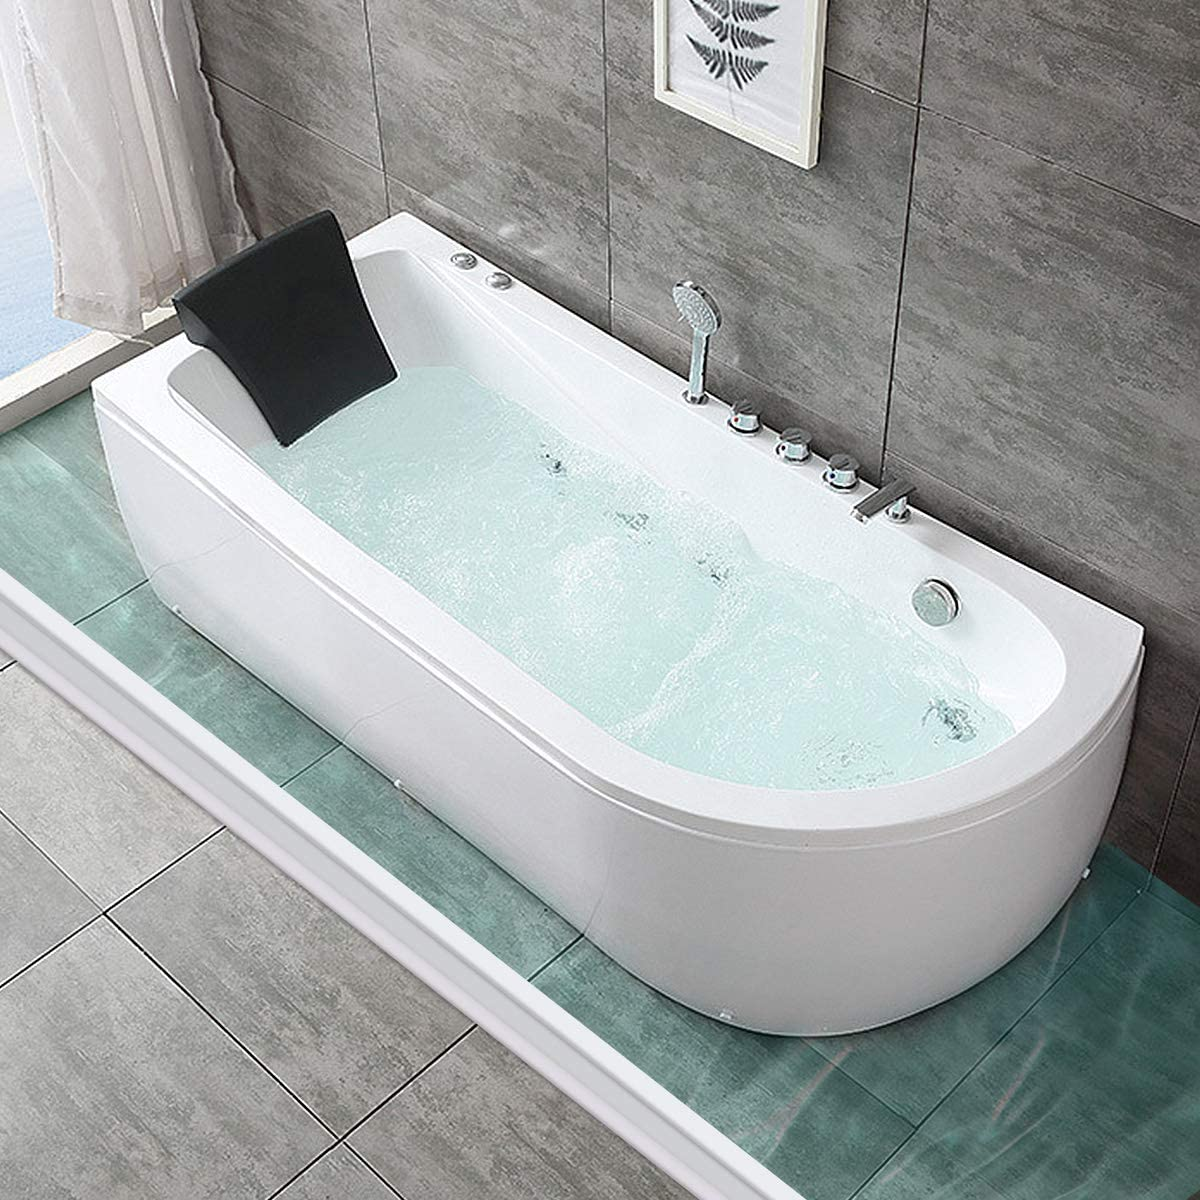 Colorjoy Umbral de ducha plegable Presa de agua Barrera de ducha y ...